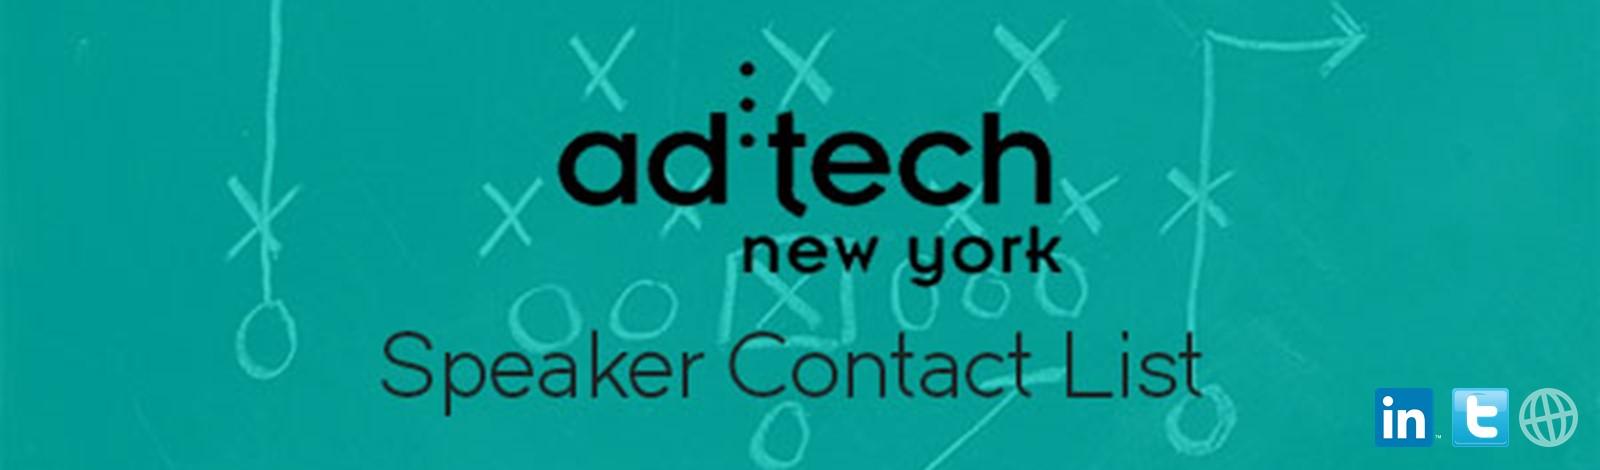 ad:tech New York Speaker Contact List